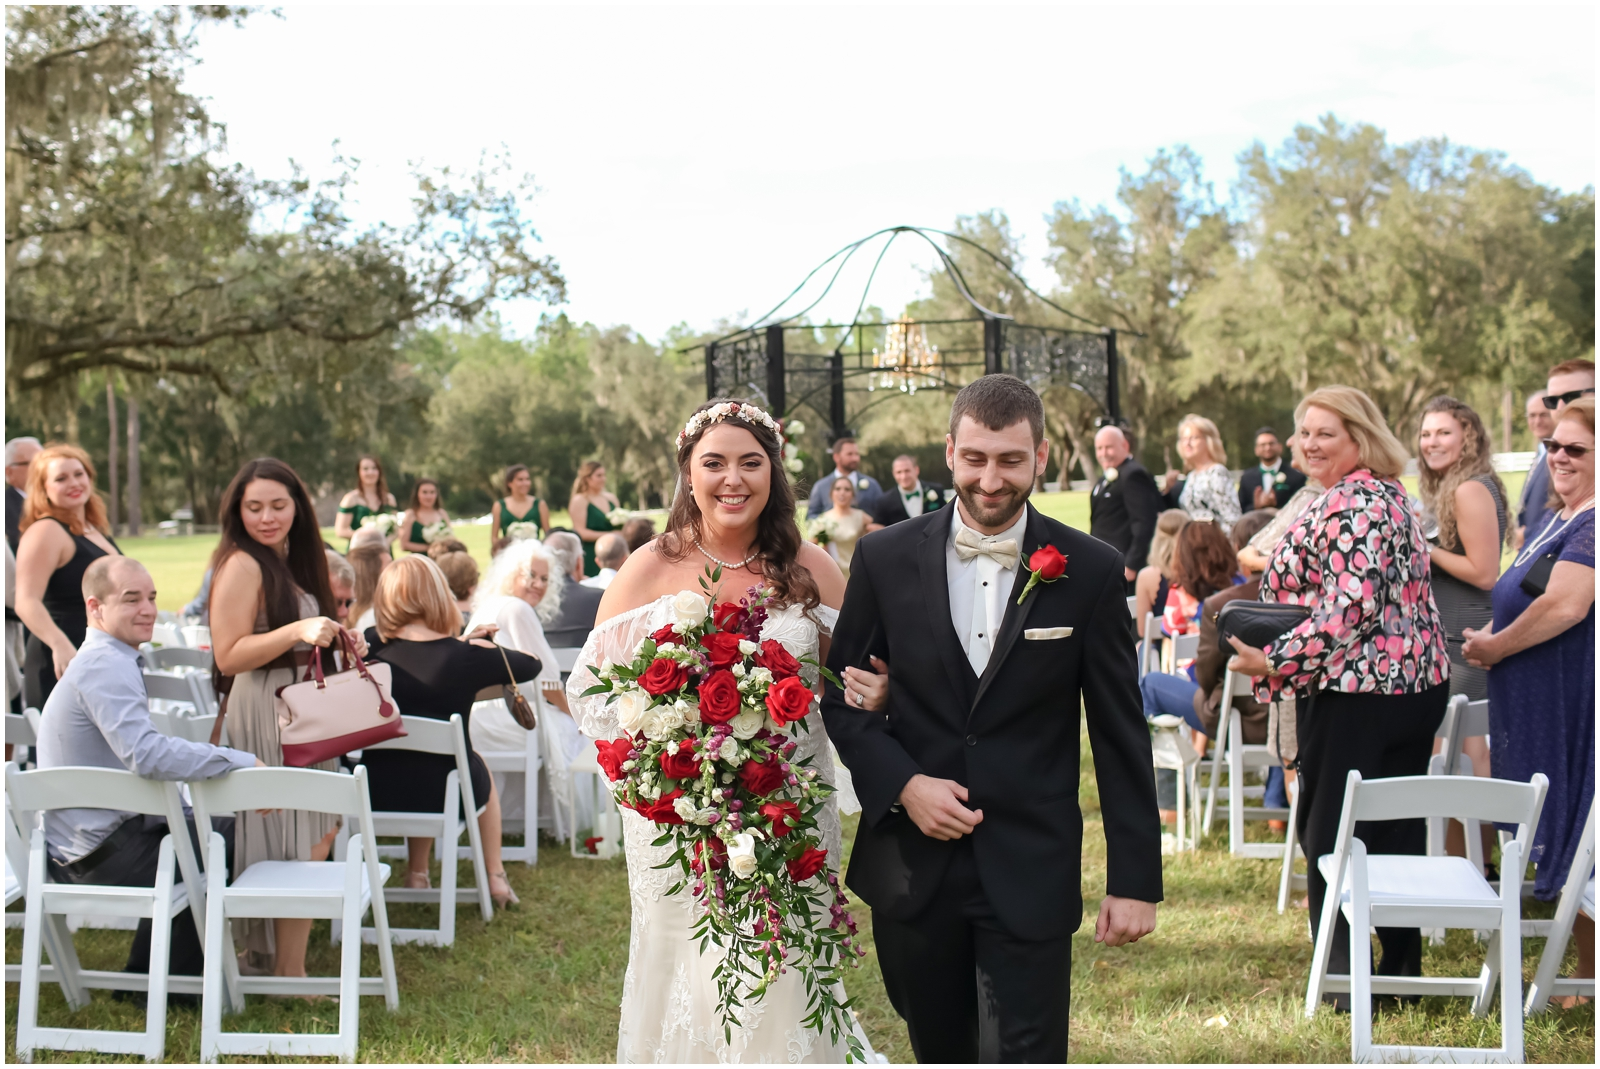 Dade City Wedding Event Venue- Stonebridge_0248.jpg